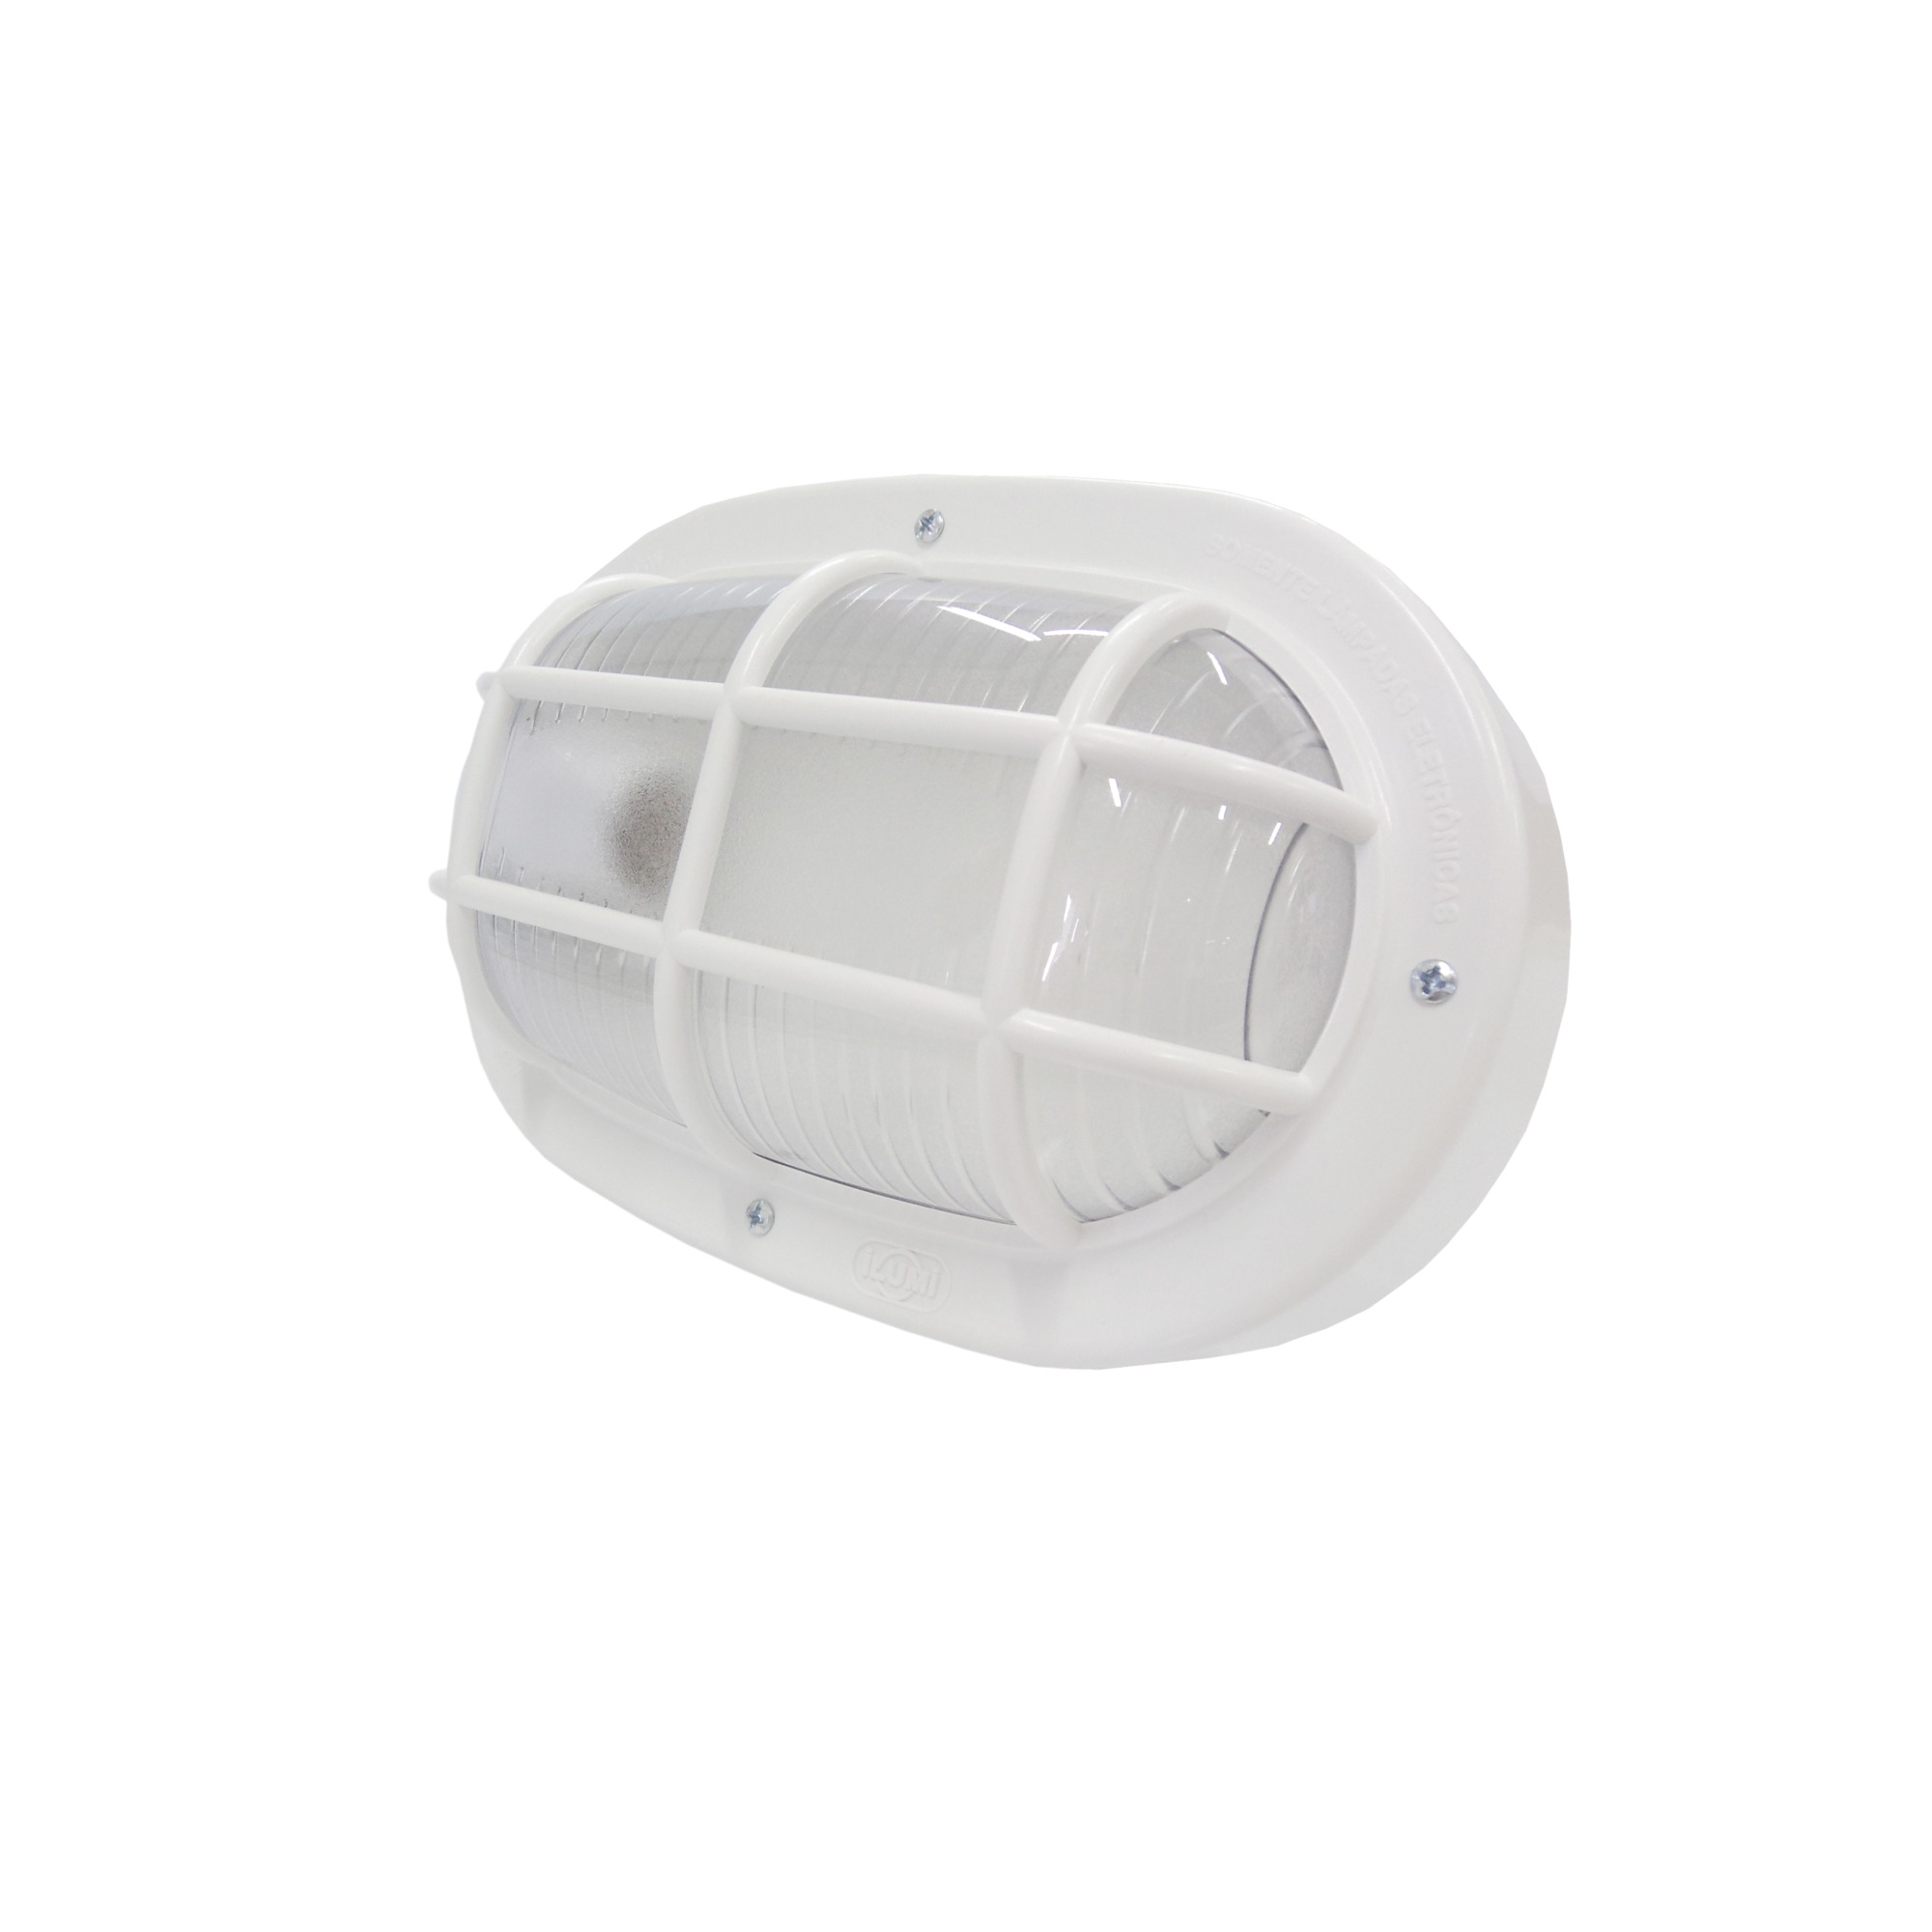 Luminaria Externa PLS Tartaruga Oval Branca 16110 - Ilumi